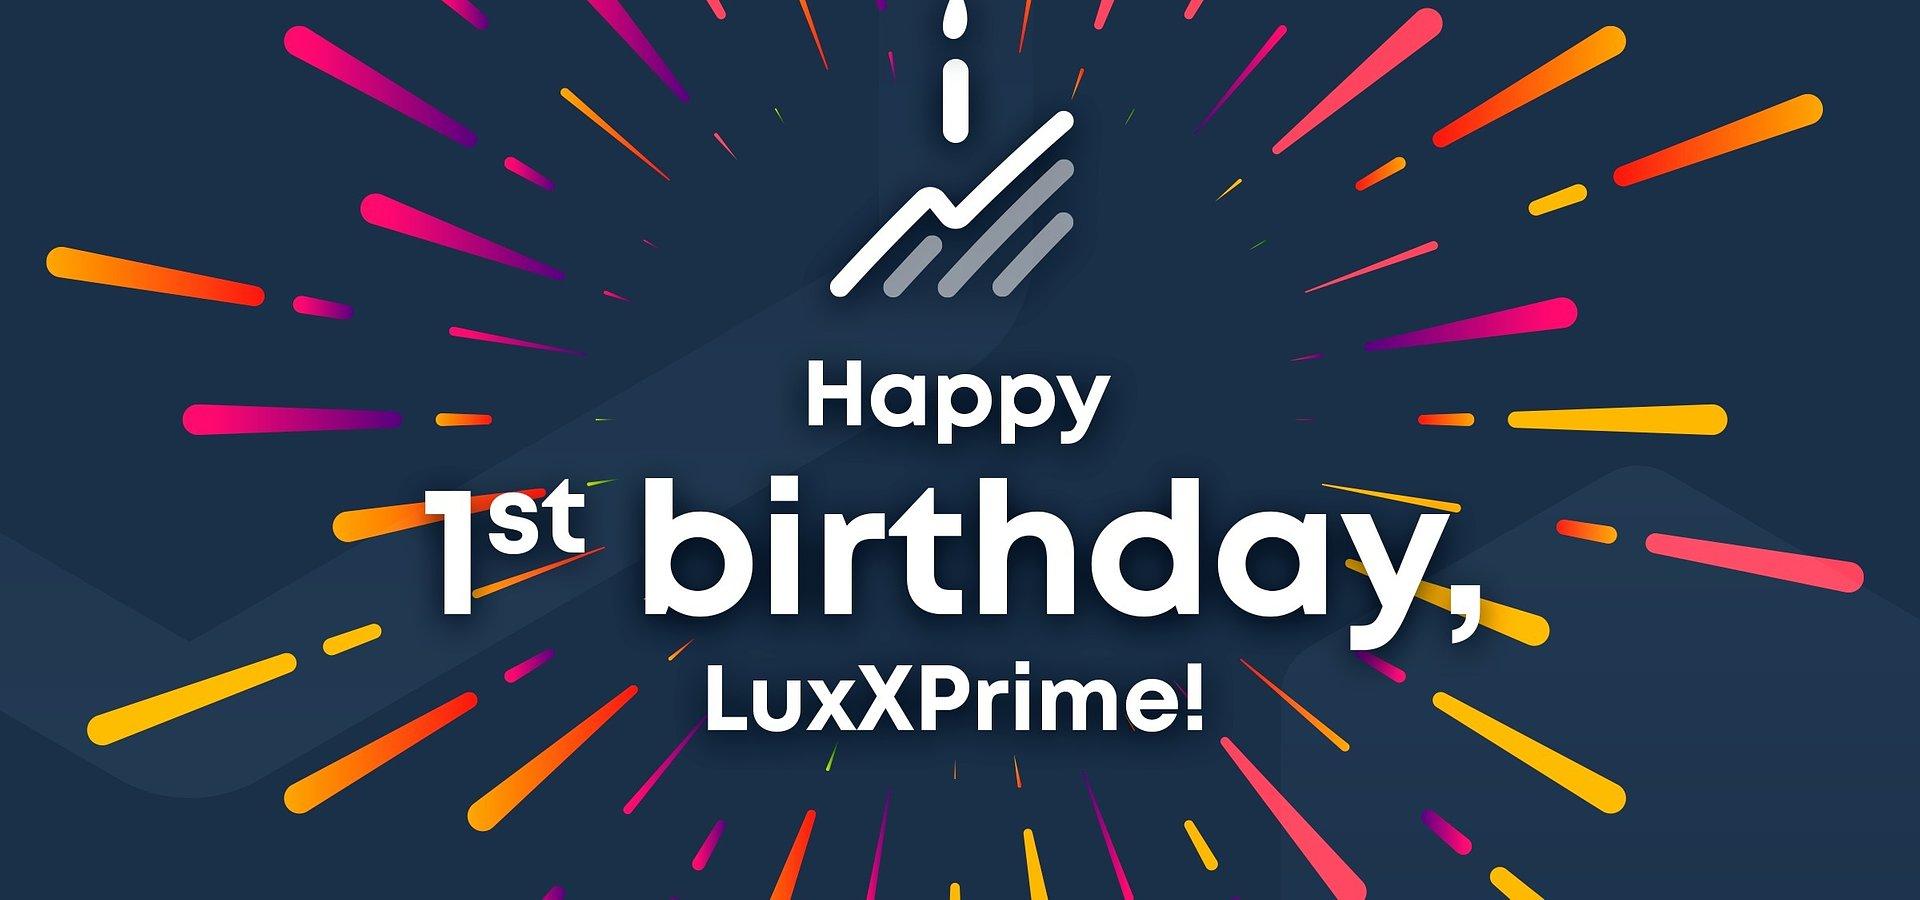 Happy 1st Anniversary, LuxXPrime!